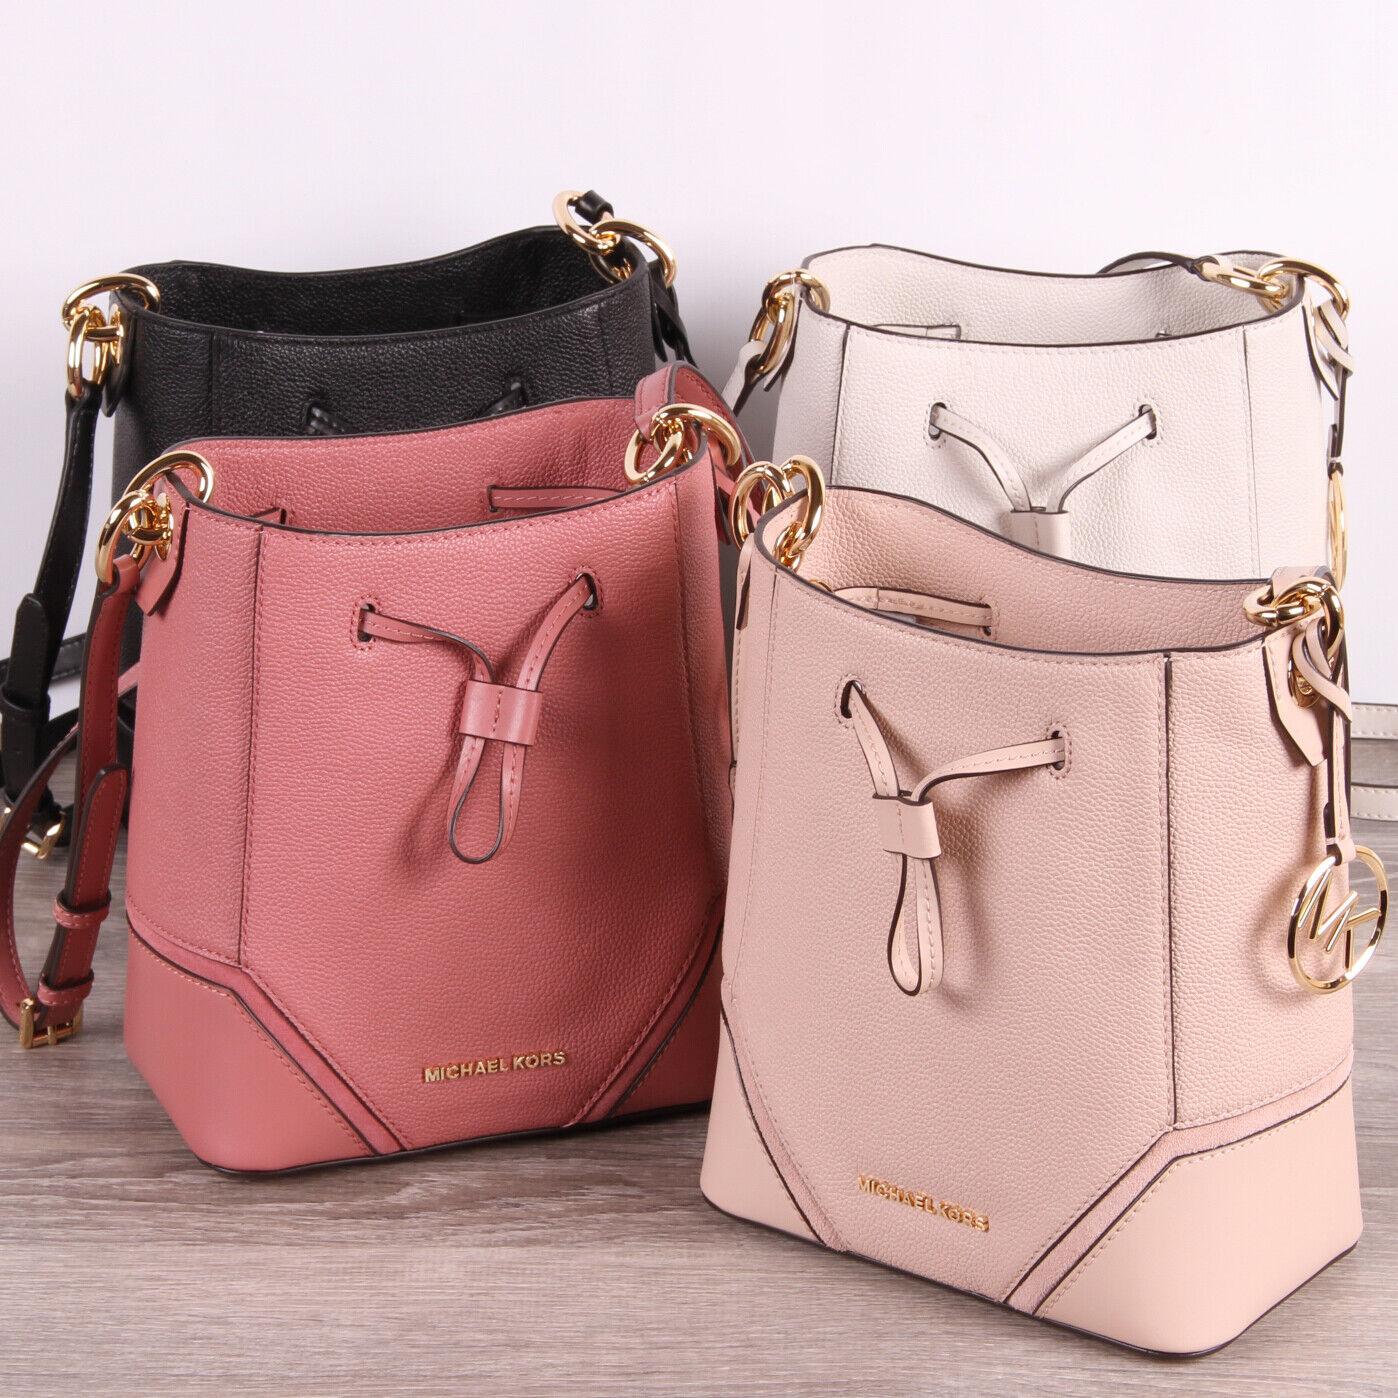 Michael Kors NICOLE Small Bucket Leather Drawstring Bag Cros